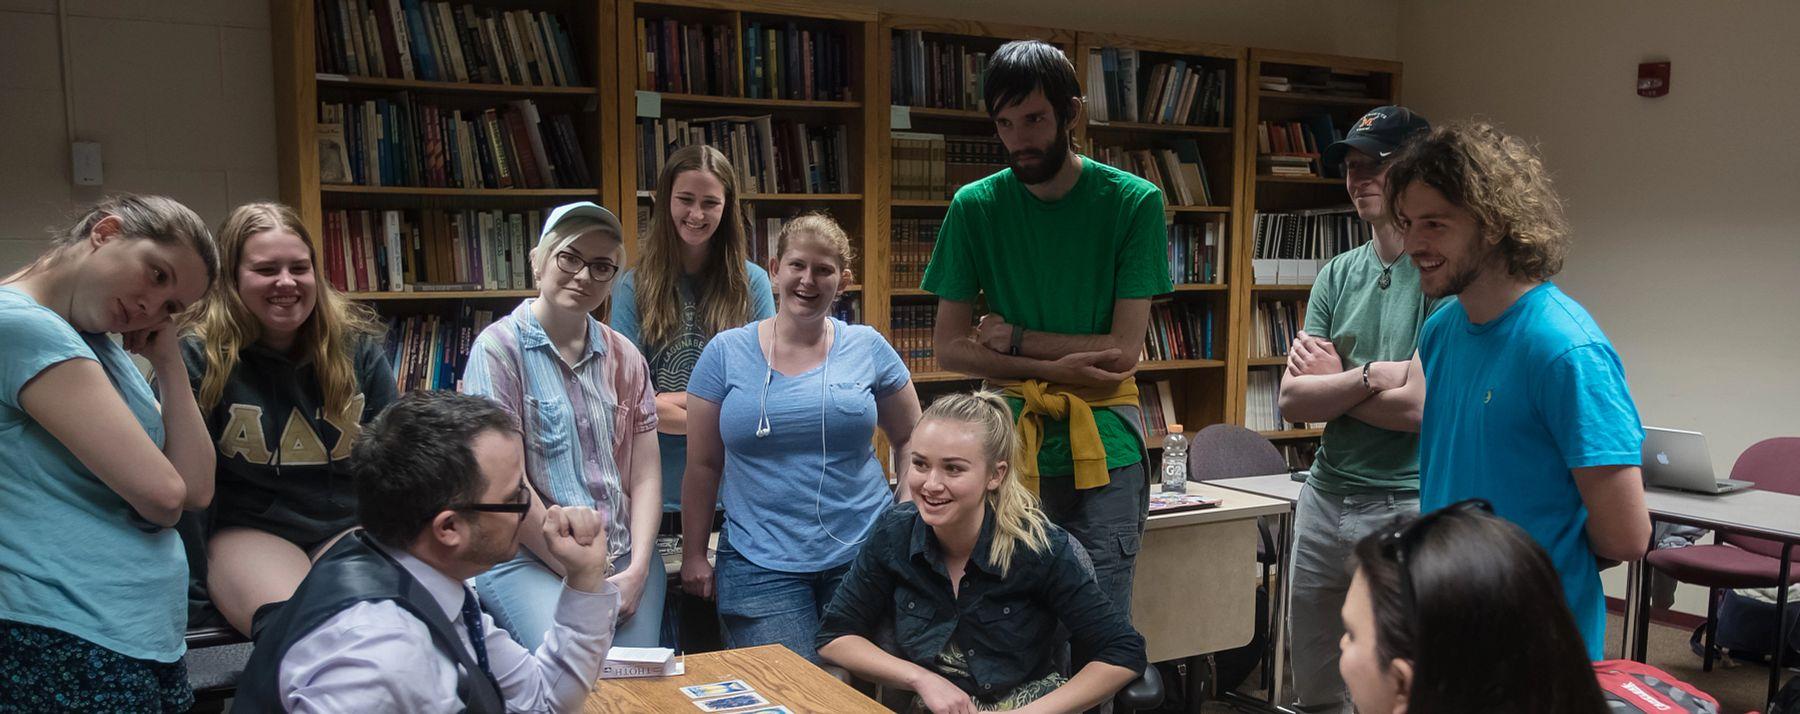 Religious Studies Students in Classroom